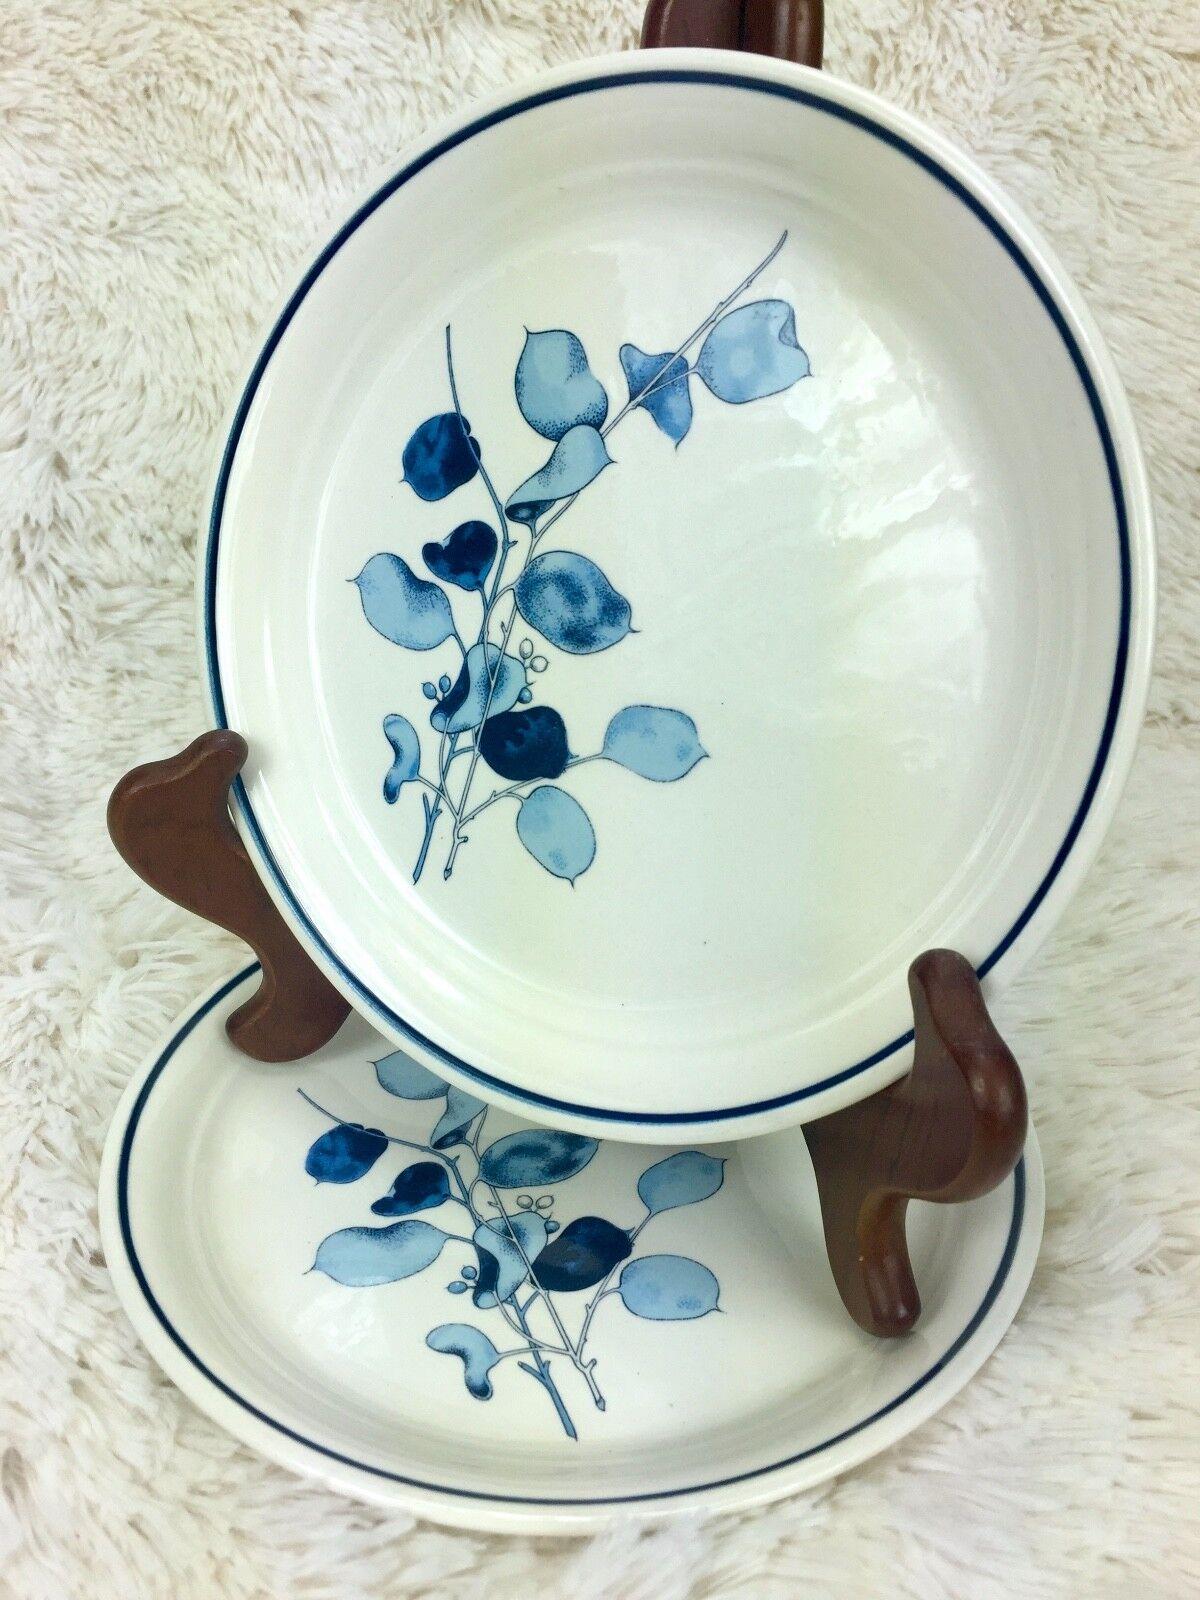 Set of 2 Arklow Irish-Moors 7.5  Salad Plates - bleu Leaf Design - Ireland